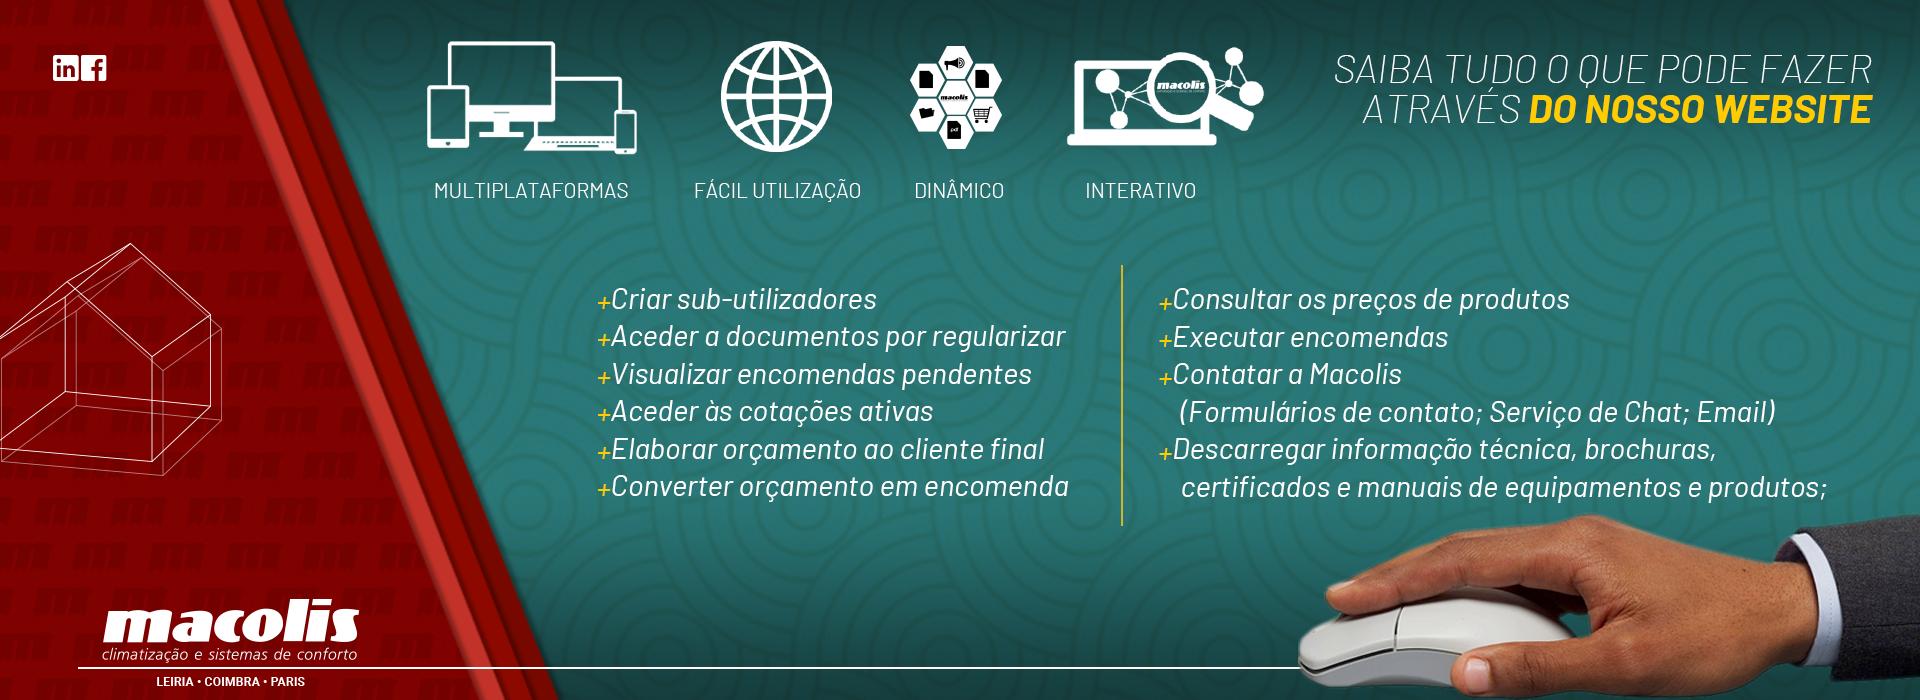 Funcionalidades do website